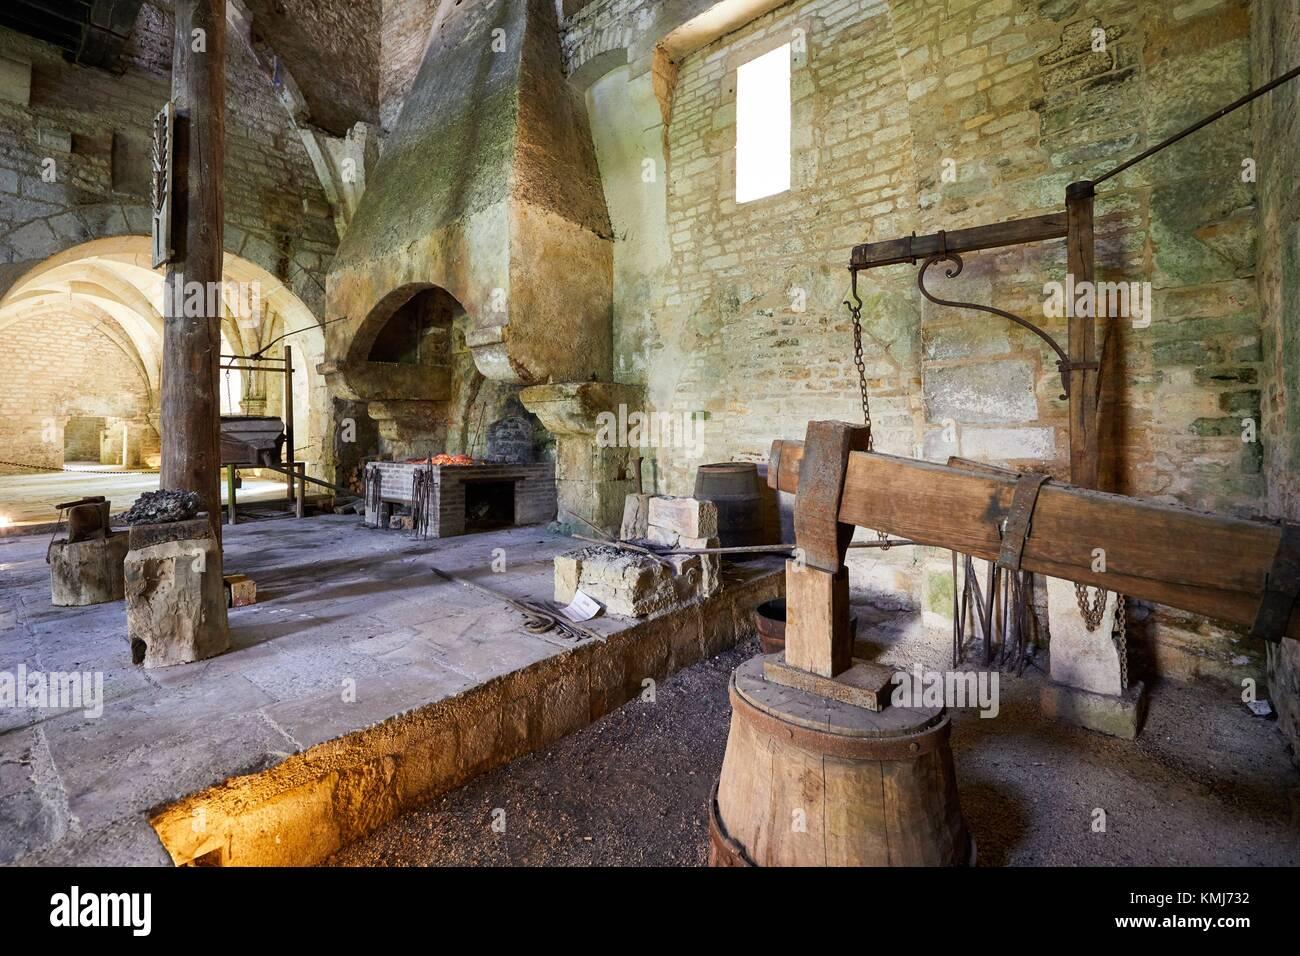 Marteau hydraulique, forge, Abbaye Royale de Notre Dame de Fontenay, l'abbaye cistercienne de Fontenay, Montbard, Photo Stock